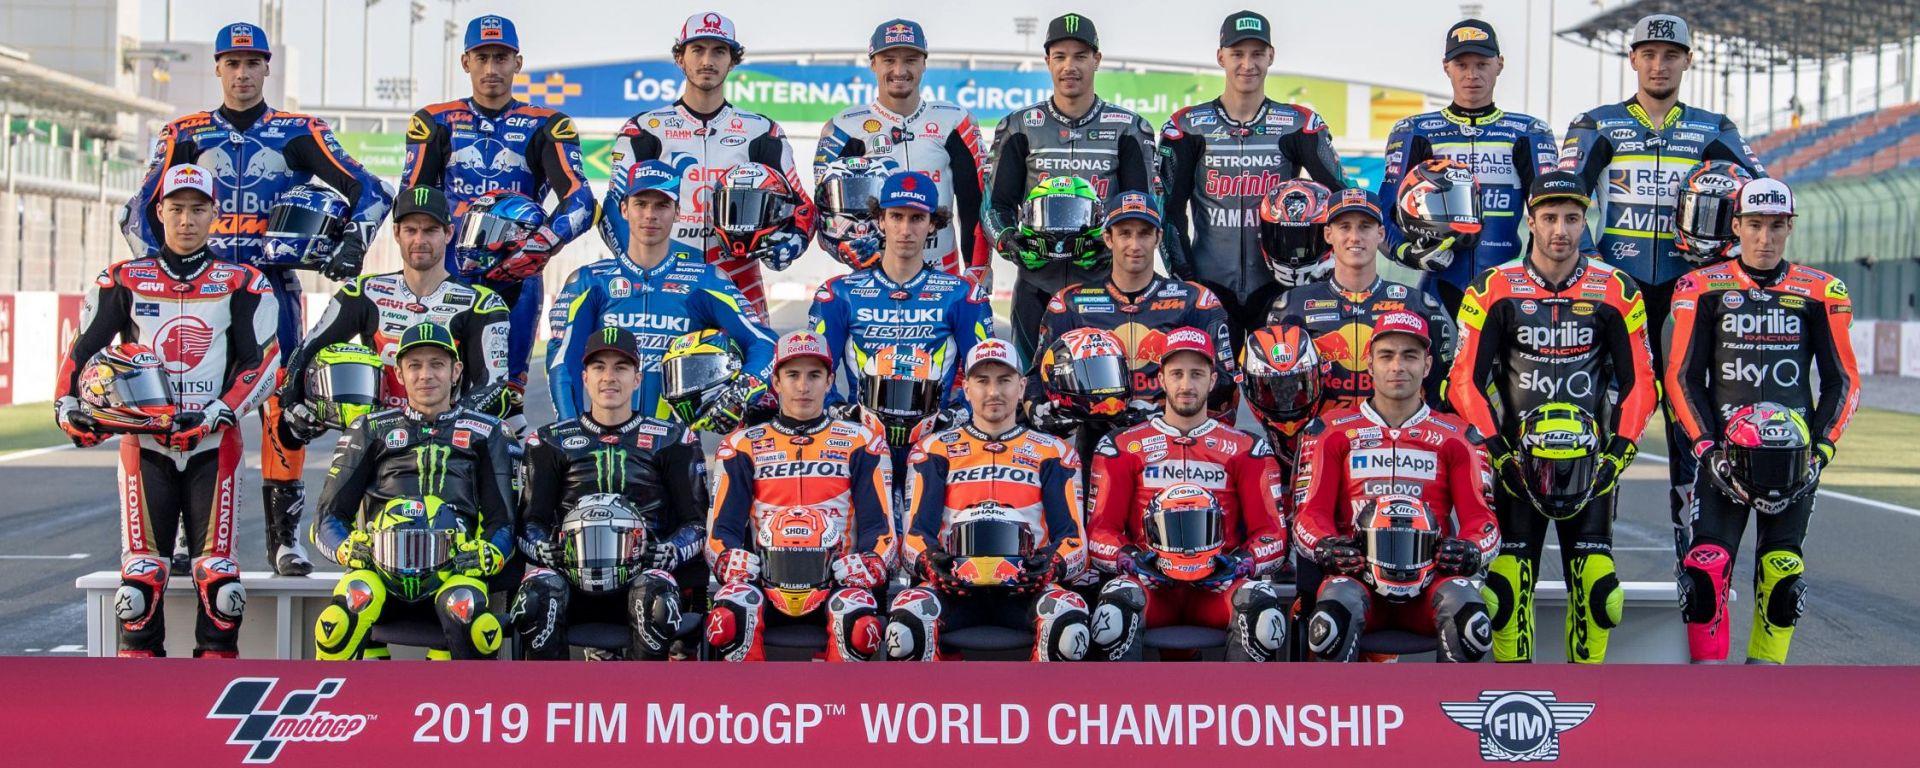 MotoGP 2019: classifica piloti e team